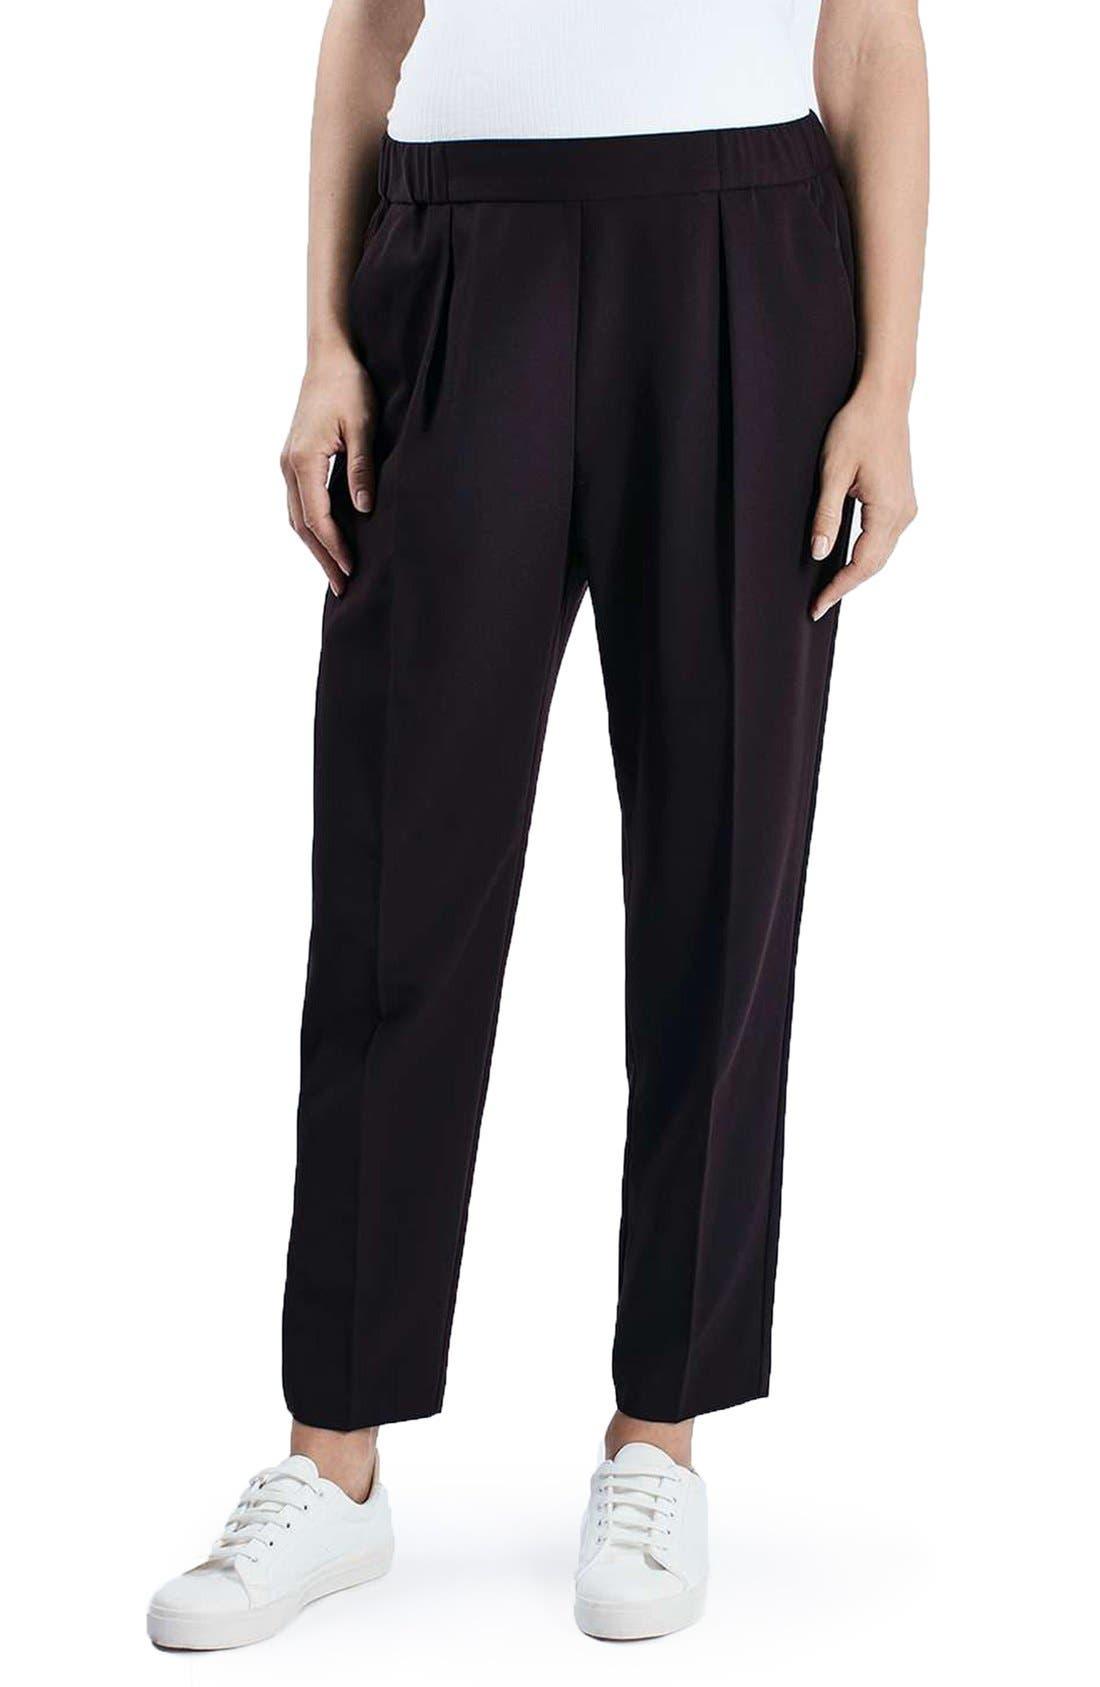 Topshop Peg Maternity Trousers